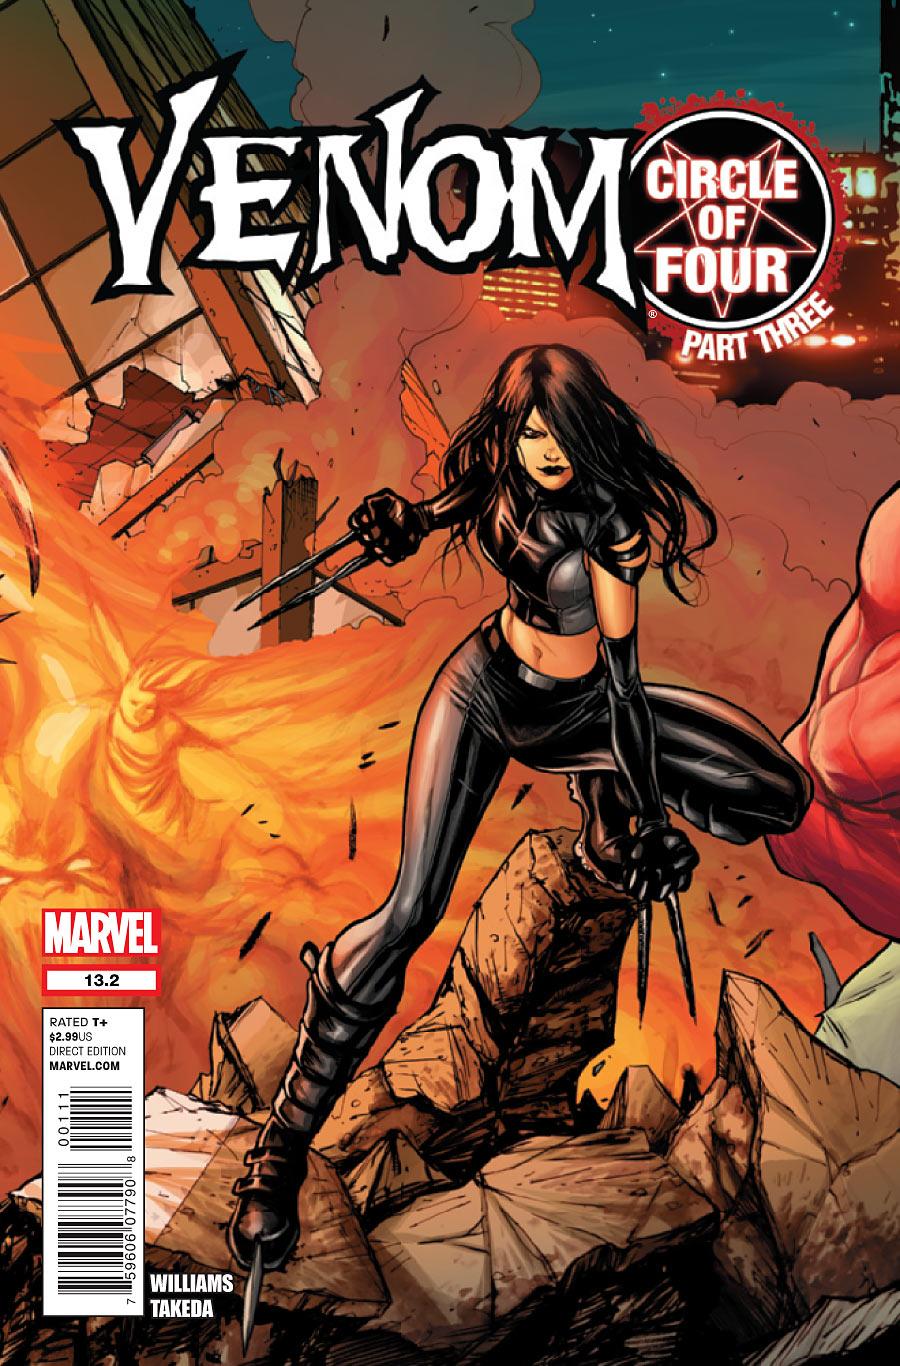 Venom Vol 2 13.2